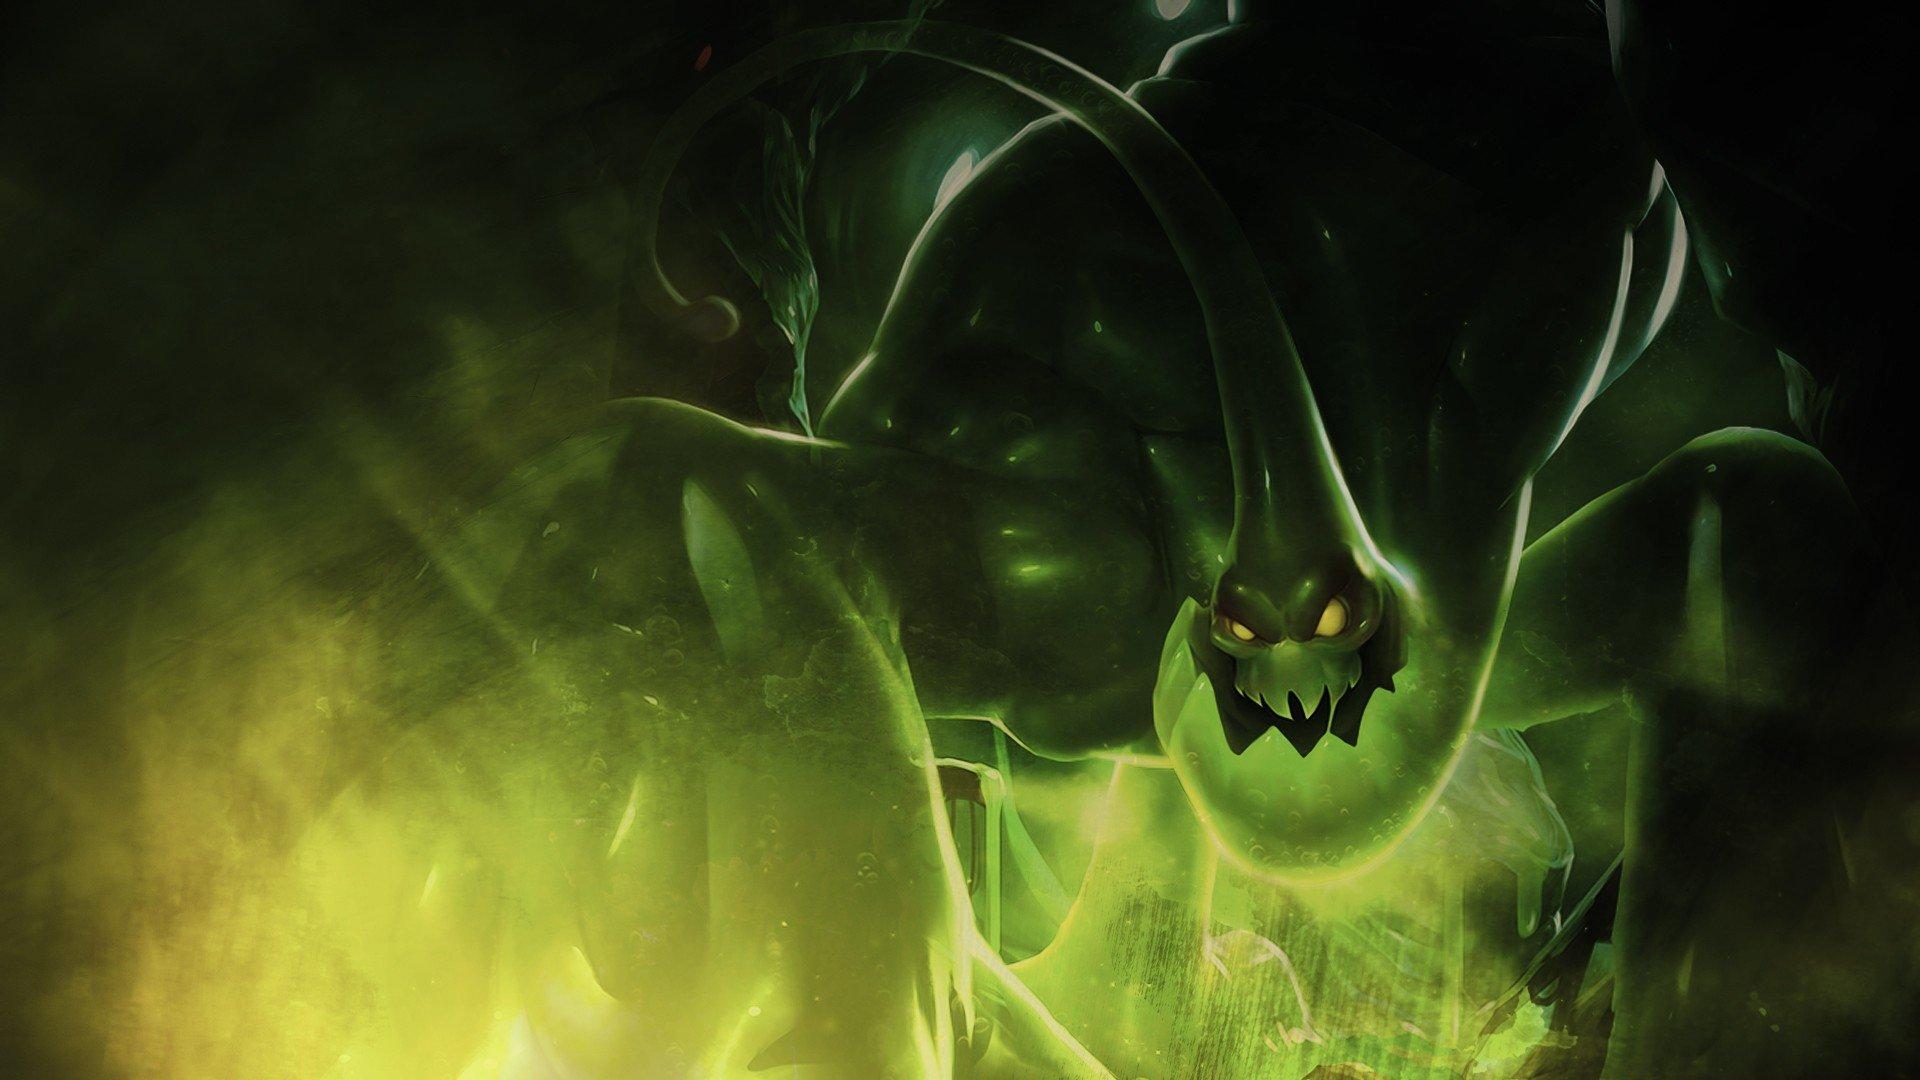 Zac League Of Legends Wallpapers Hd For Desktop Backgrounds